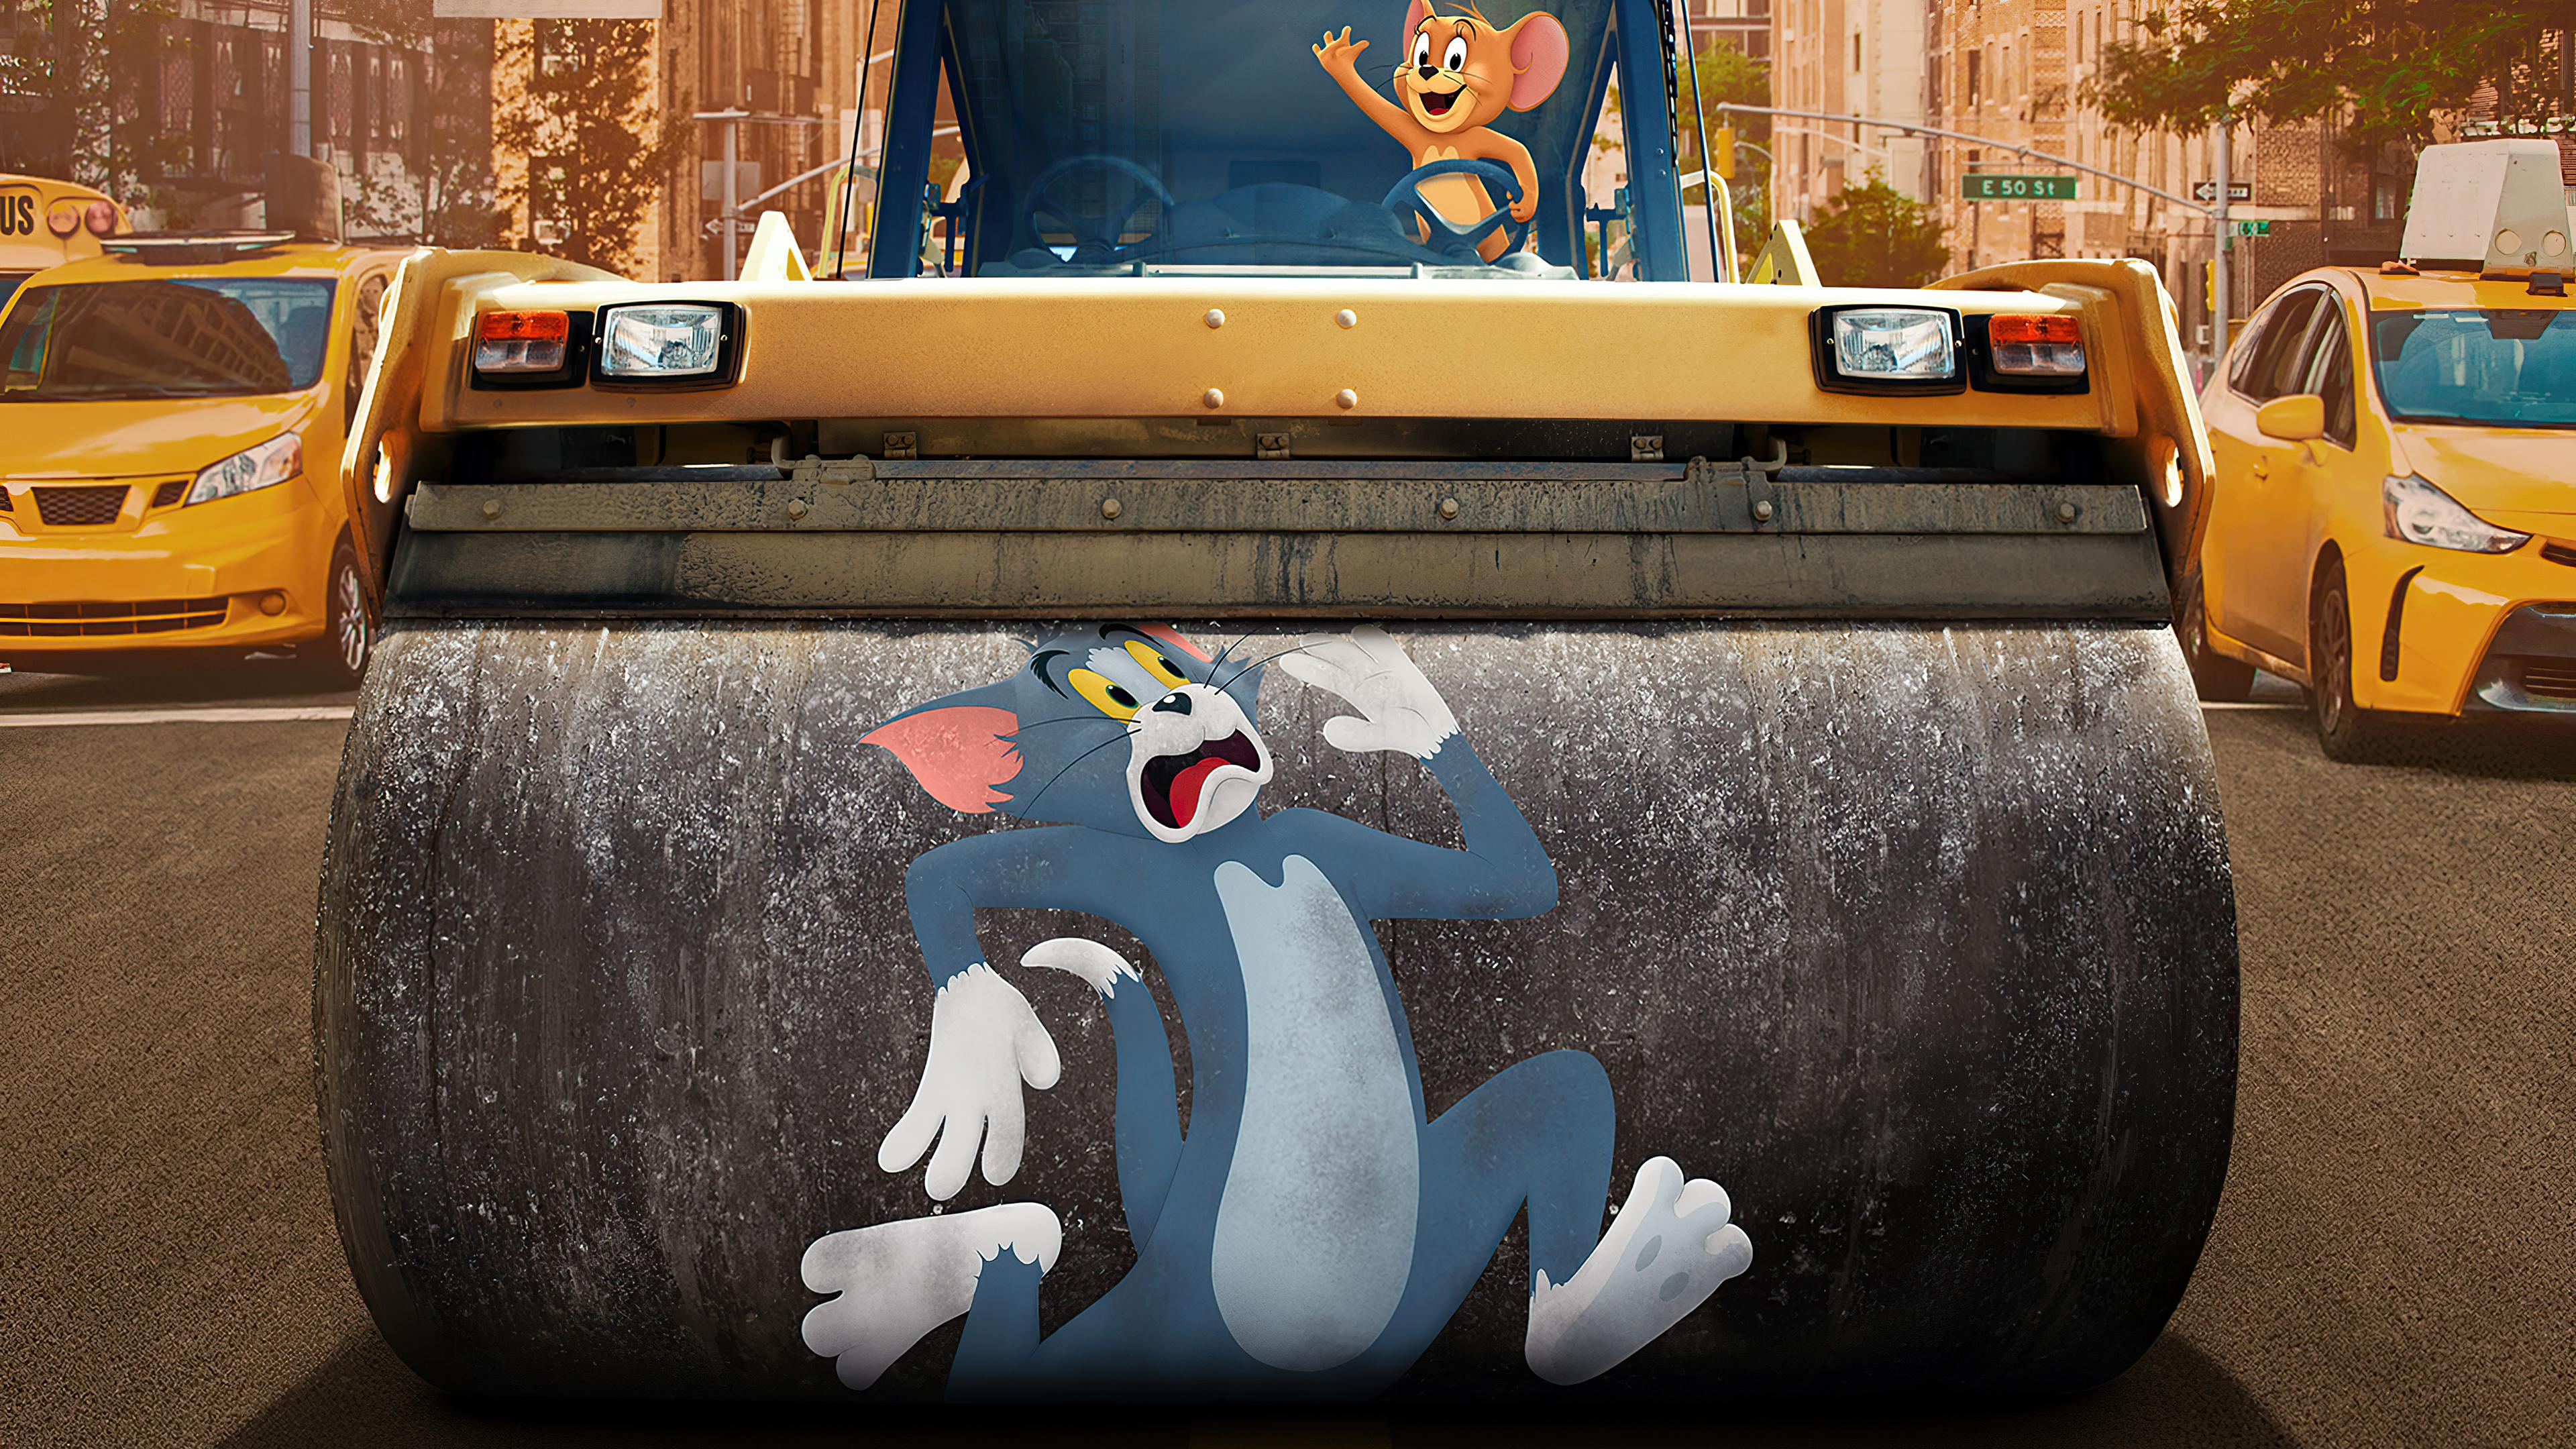 2021 tom and jerry 4k 1615195144 - 2021 Tom And Jerry 4k - 2021 Tom And Jerry 4k wallpapers